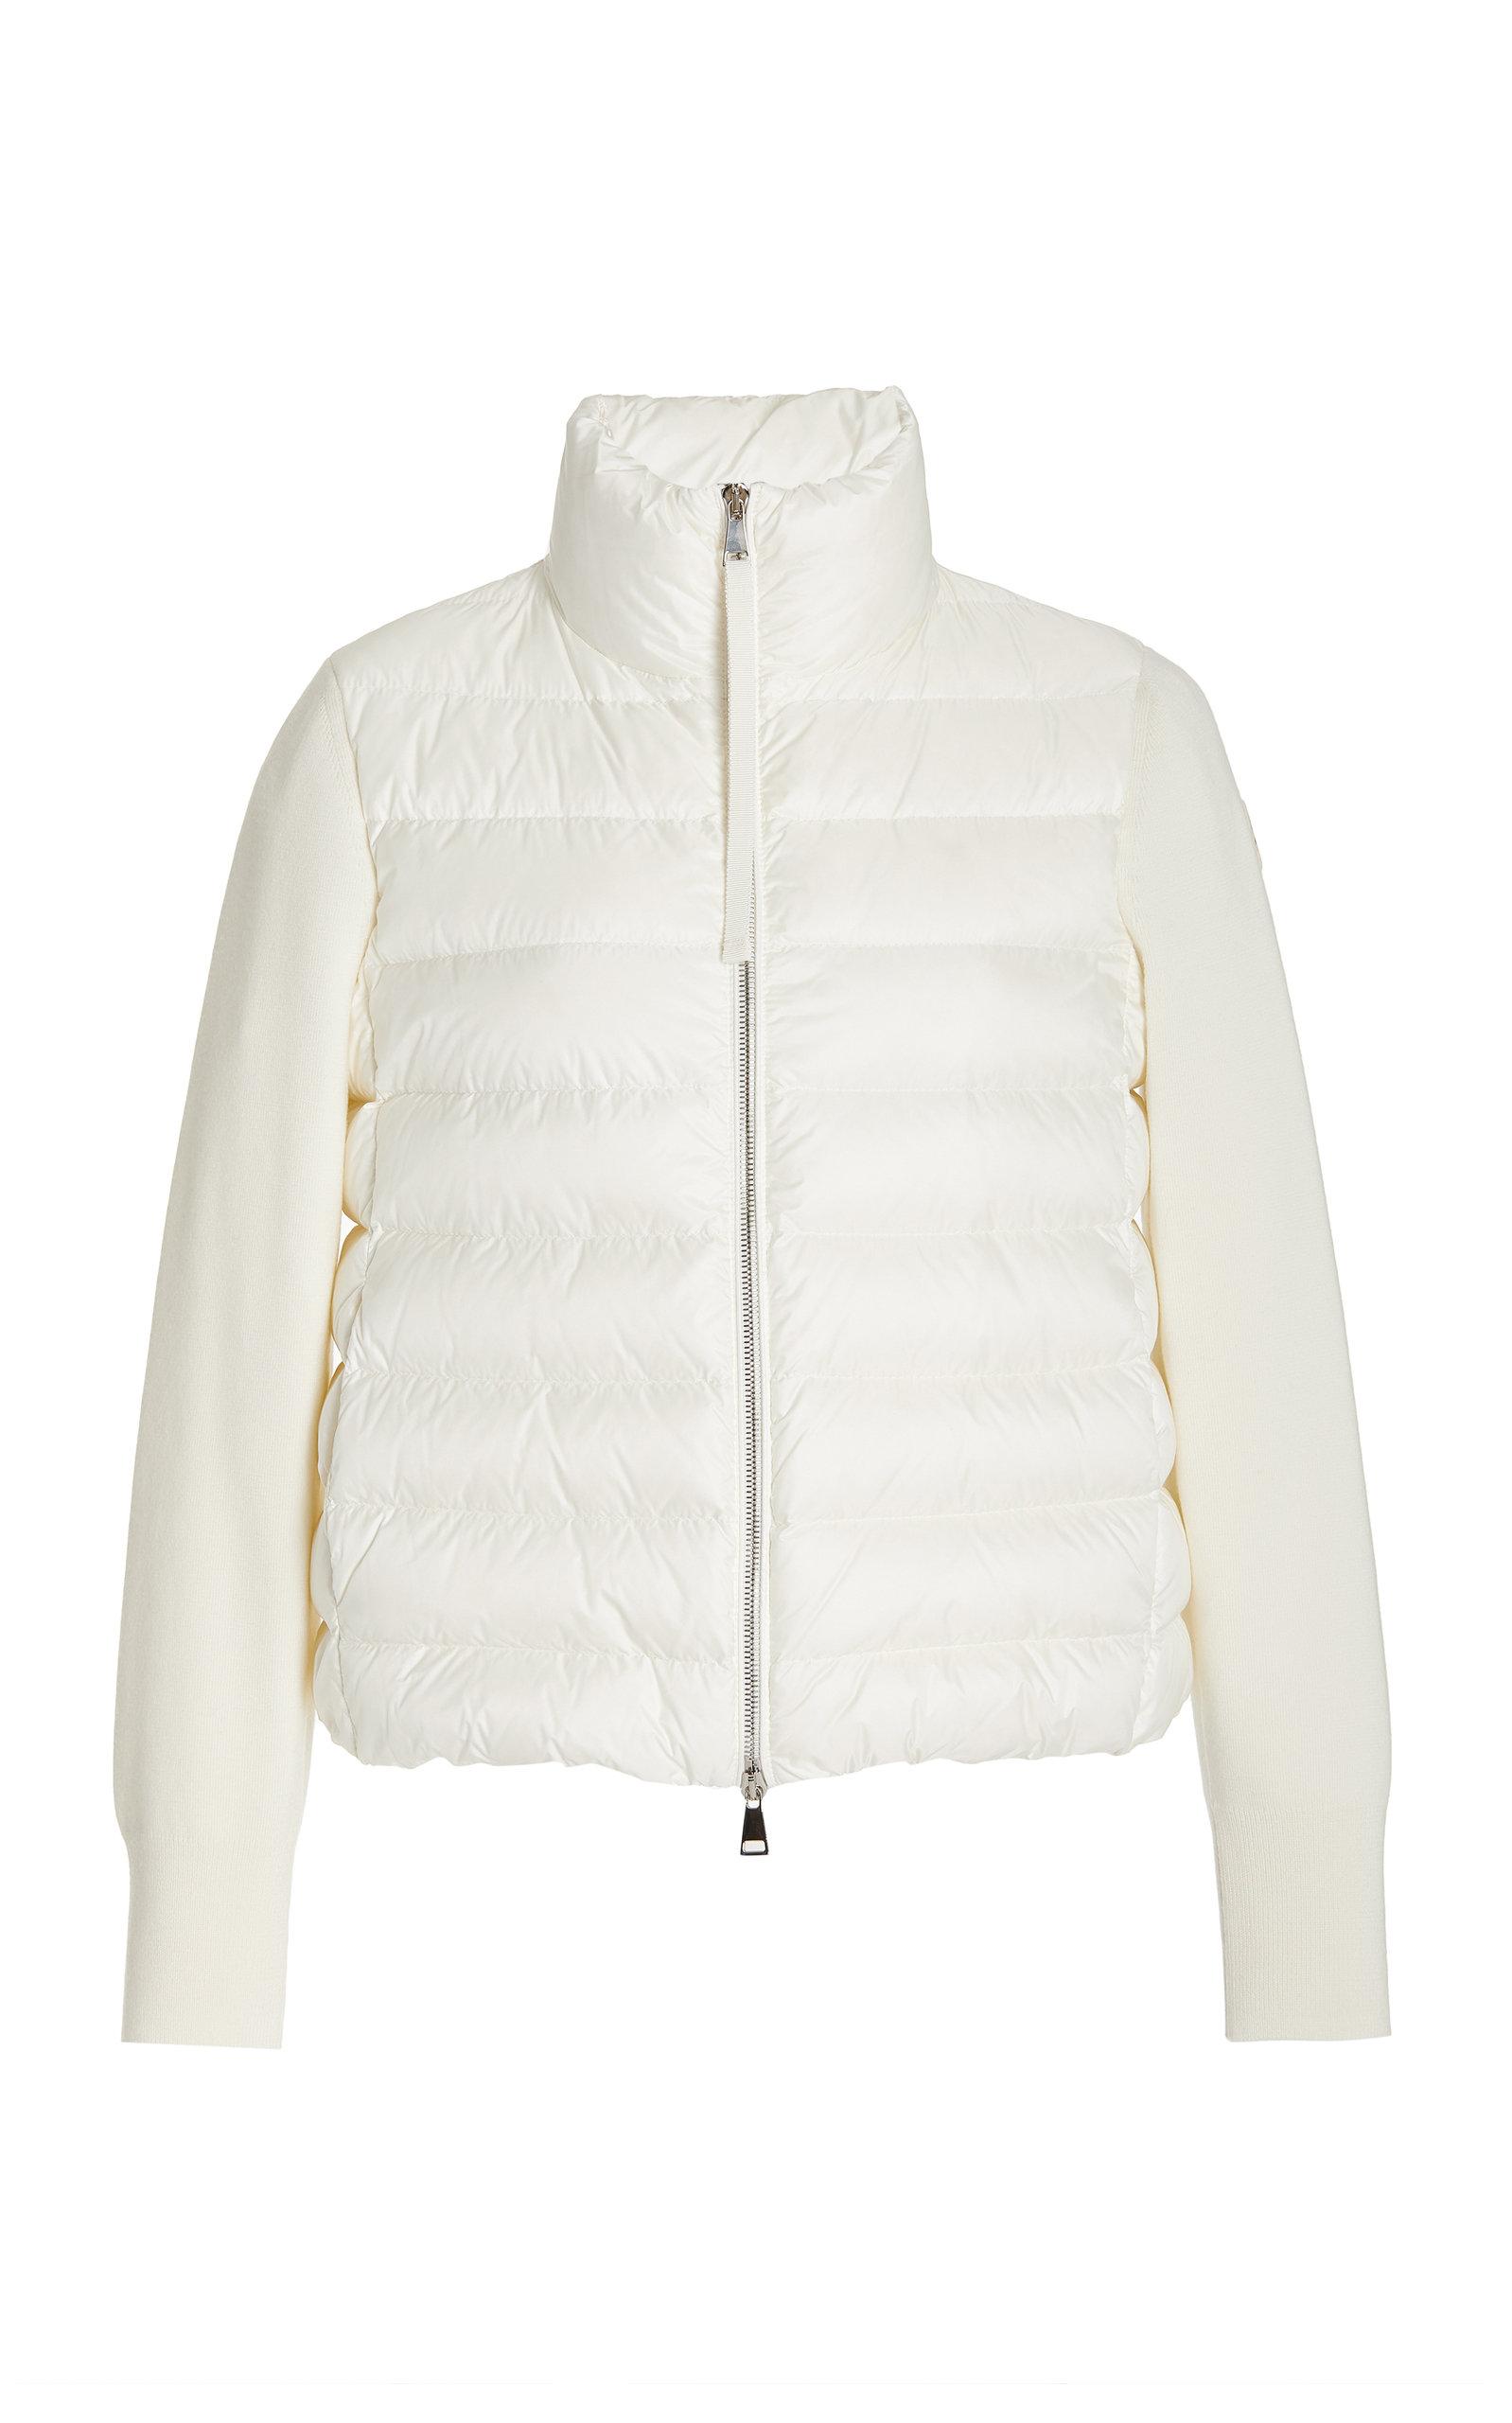 Moncler - Women's Wool-Detailed Down Puffer Jacket - White/blue - Moda Operandi